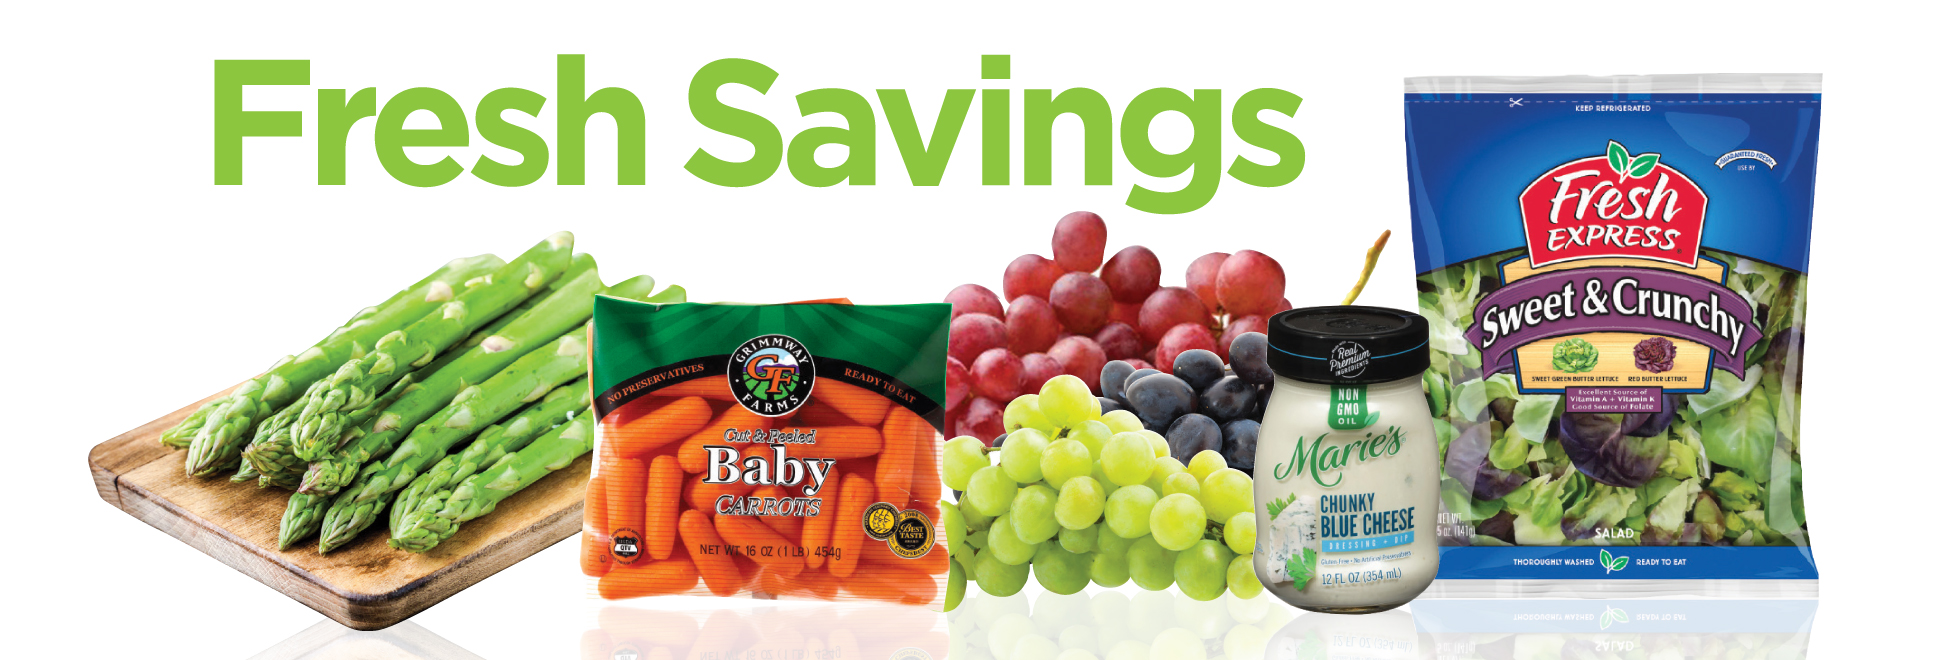 Fresh Savings